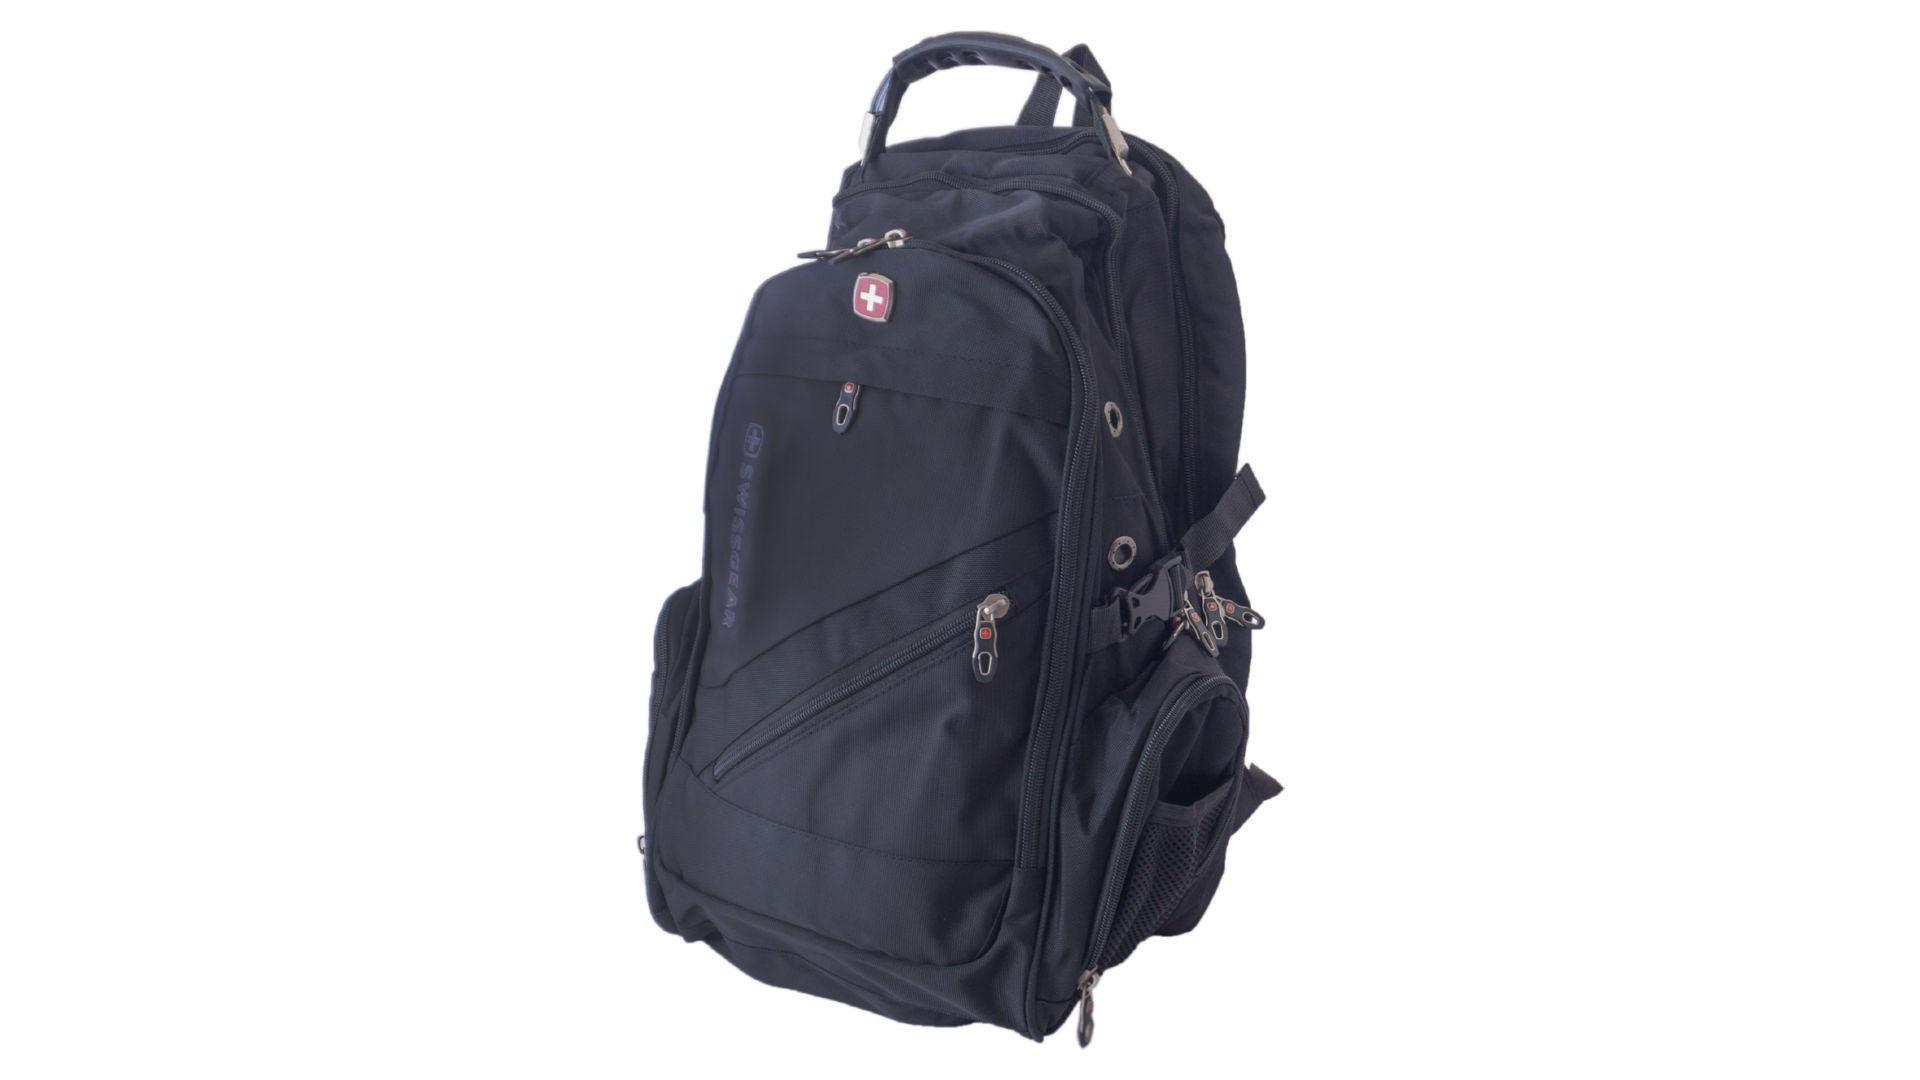 Рюкзак Swissgear - 460 х 310 х 220 мм 5